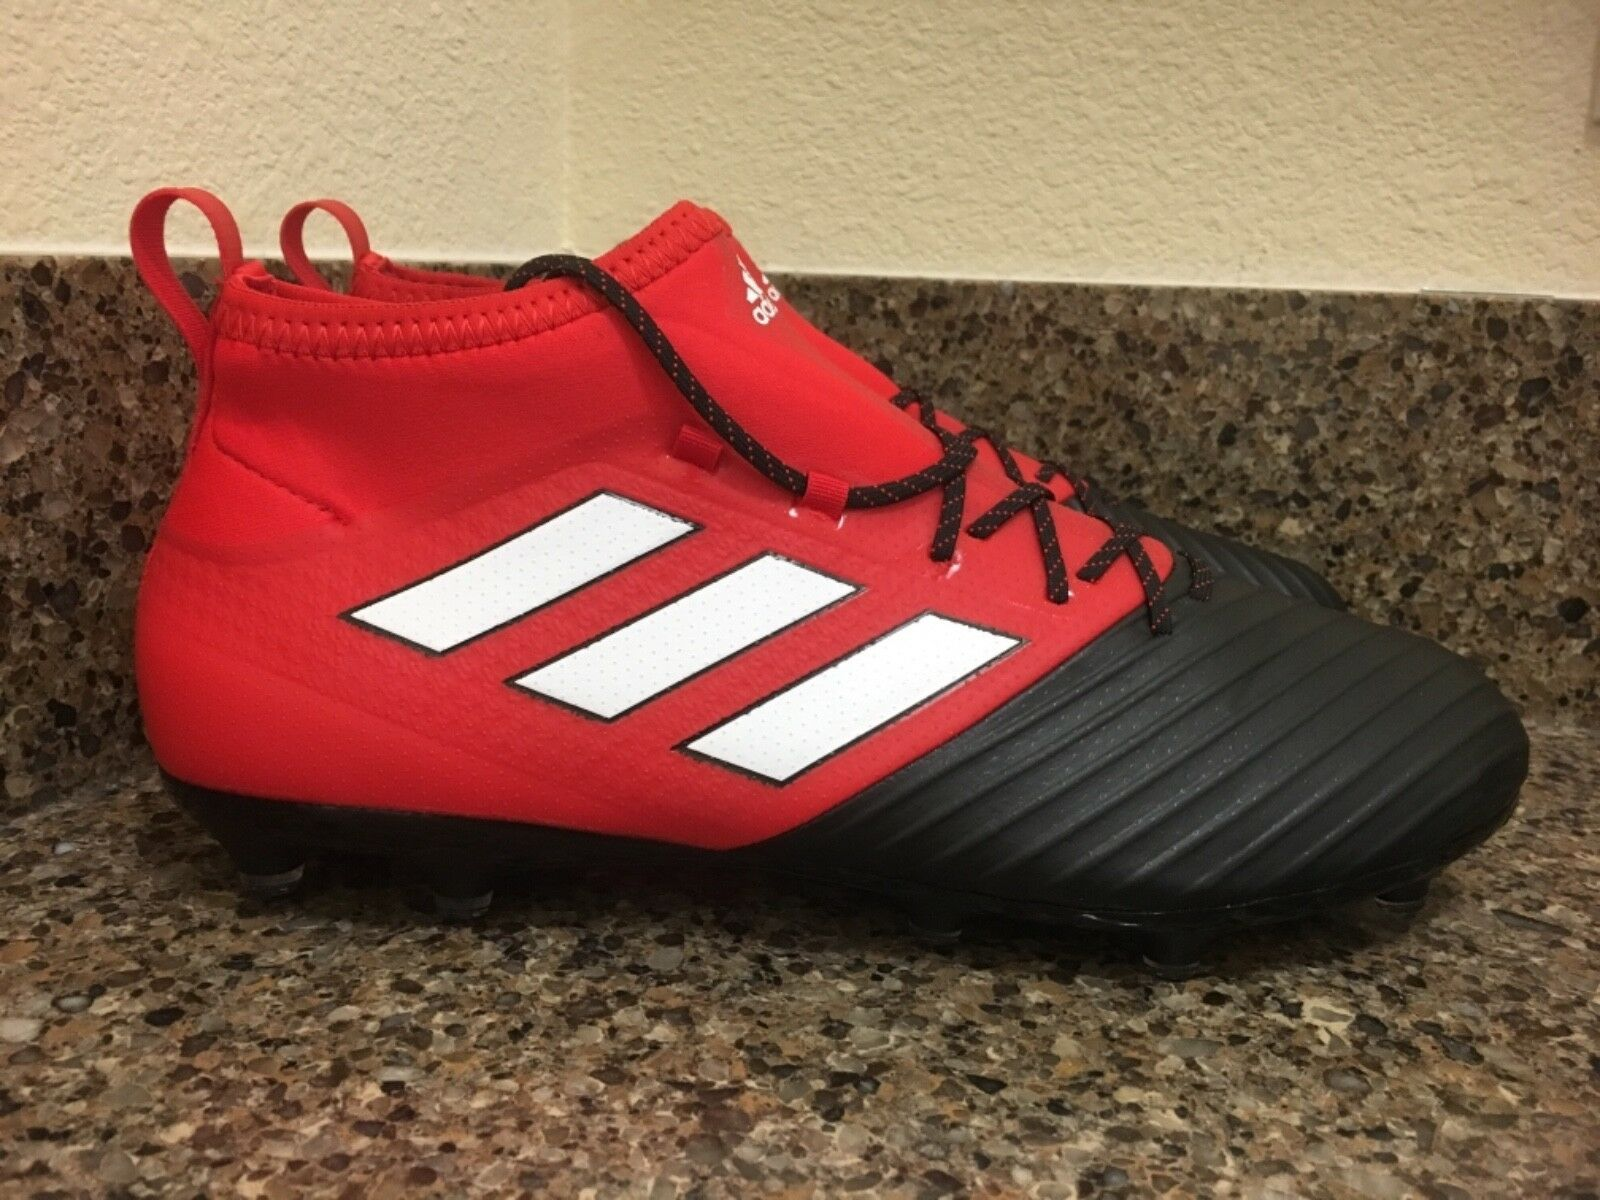 ADIDAS ACE 17.2 FG PRIMEMESH FG 17.2 Soccer Cleat RED/BLACK/WHITE BB4324 Sz 9.5 e94d13